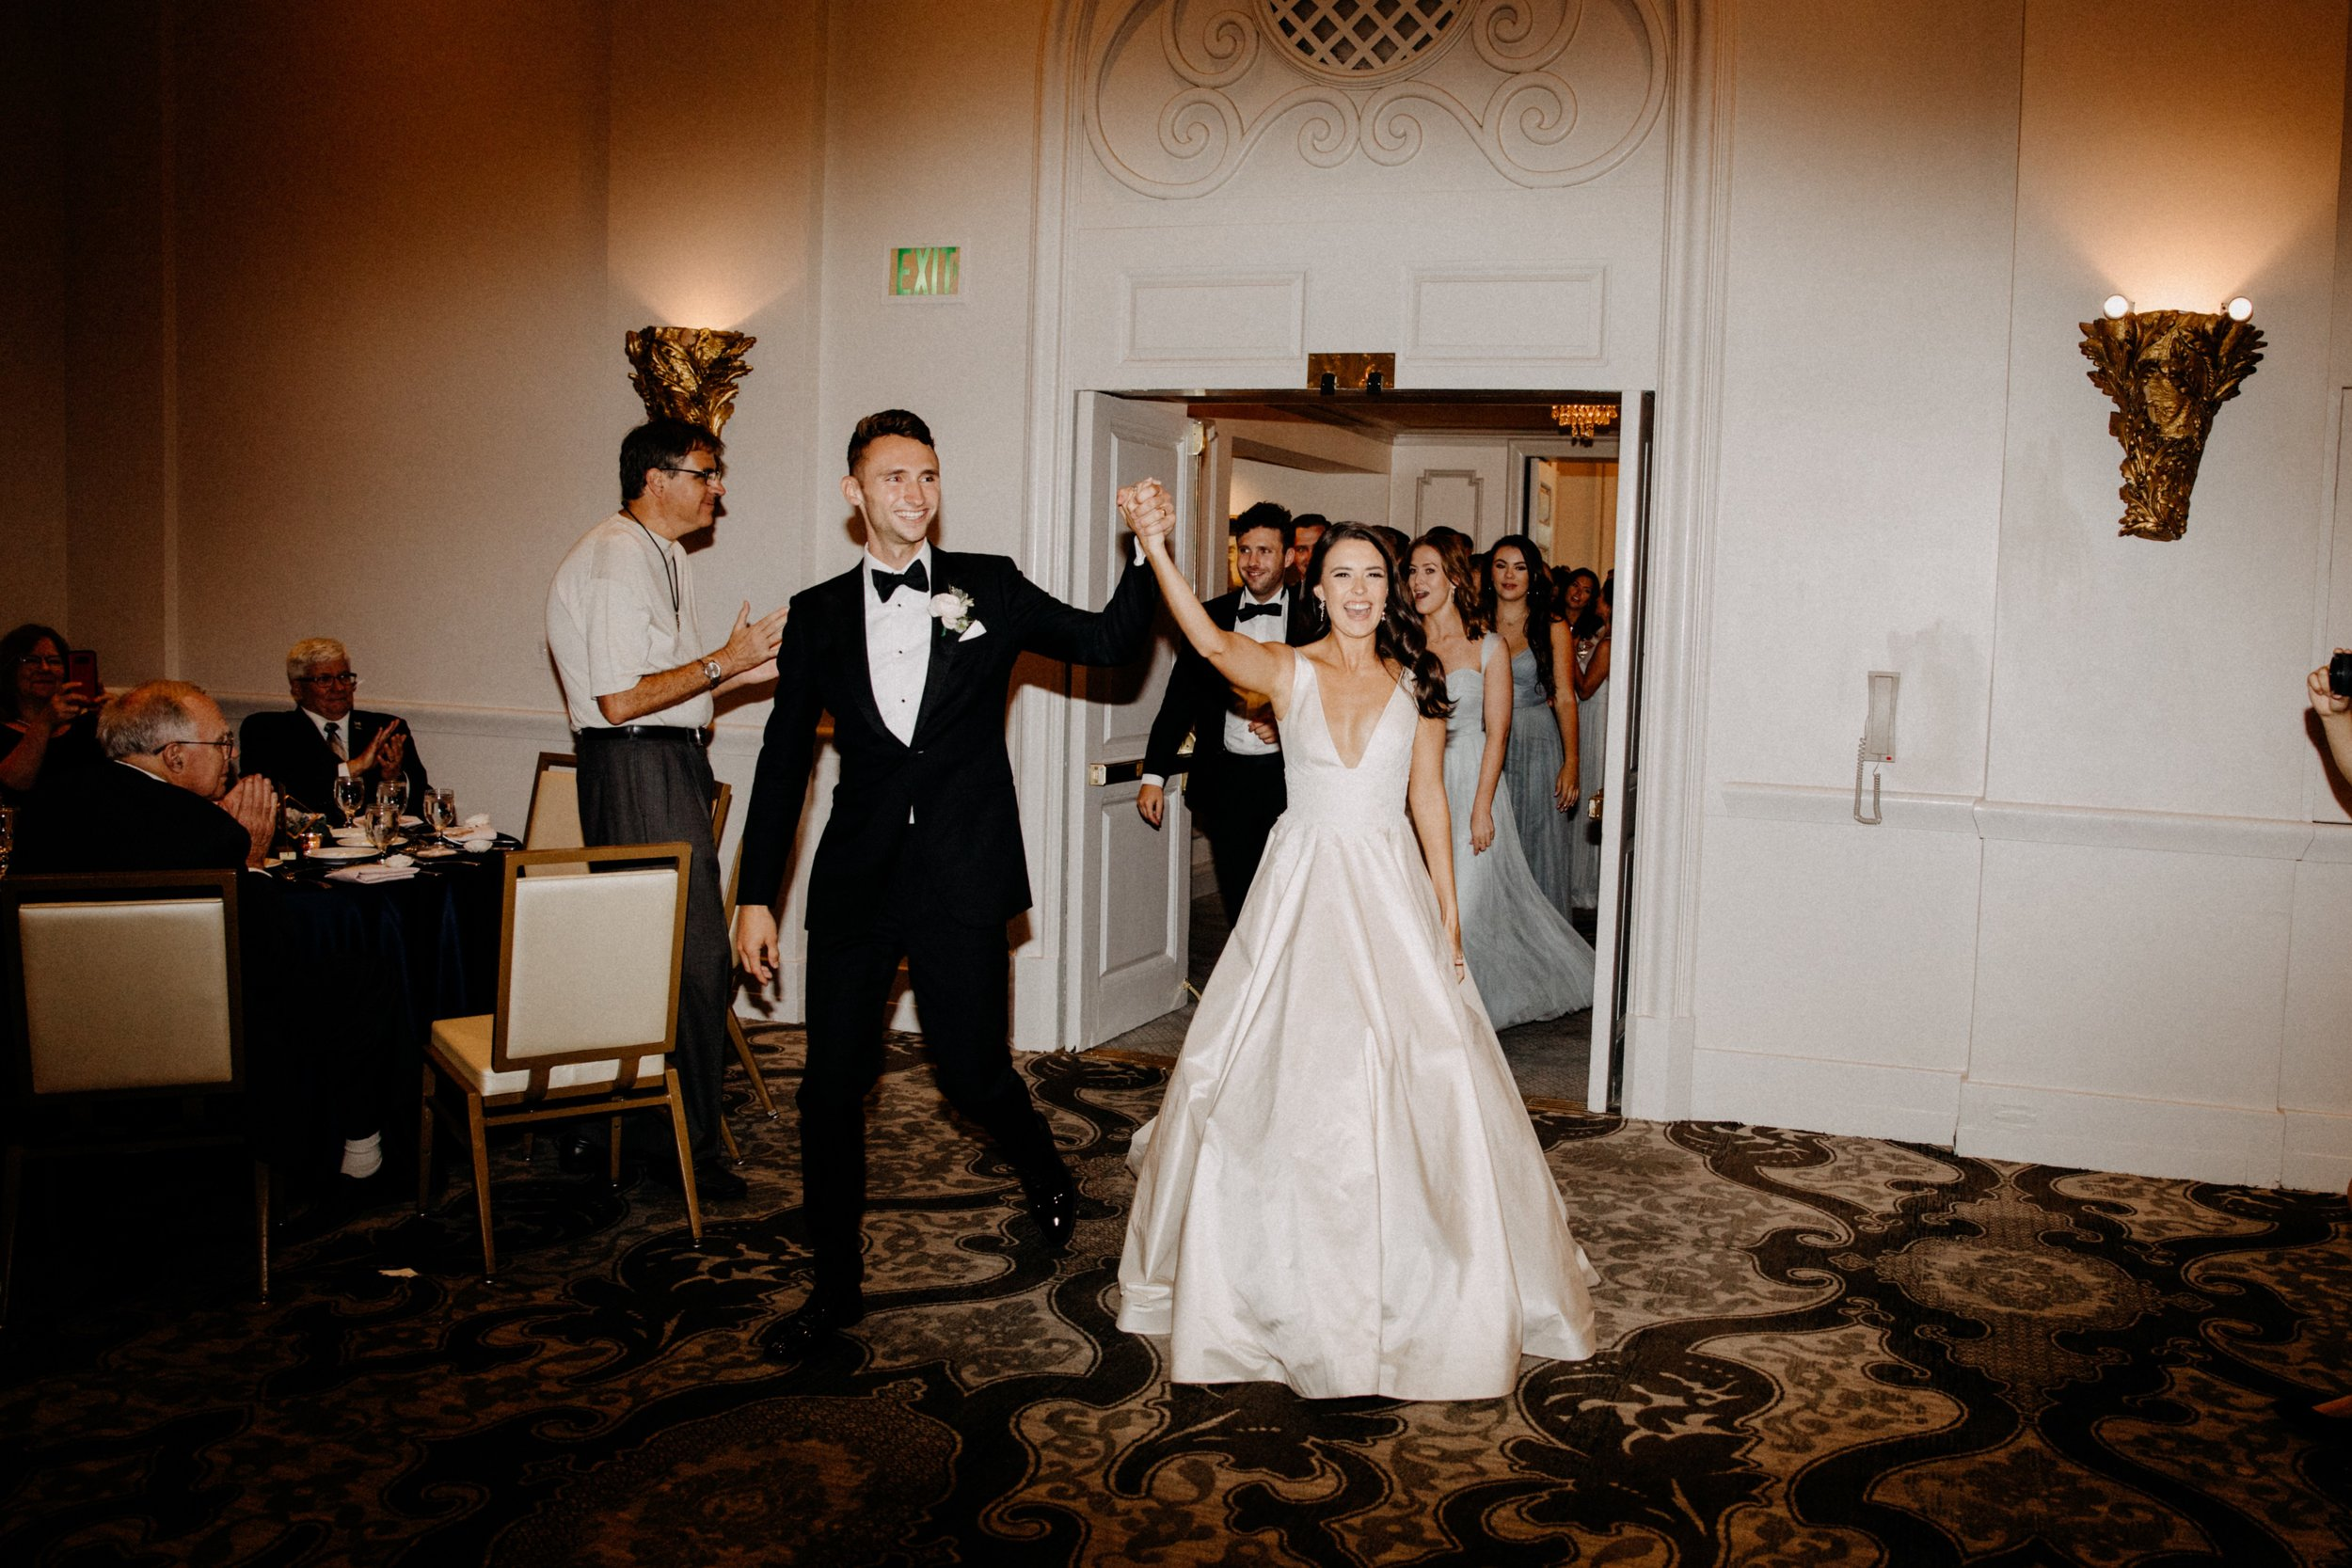 st-anthony-hotel-wedding-photography-10128san-antonio.JPG